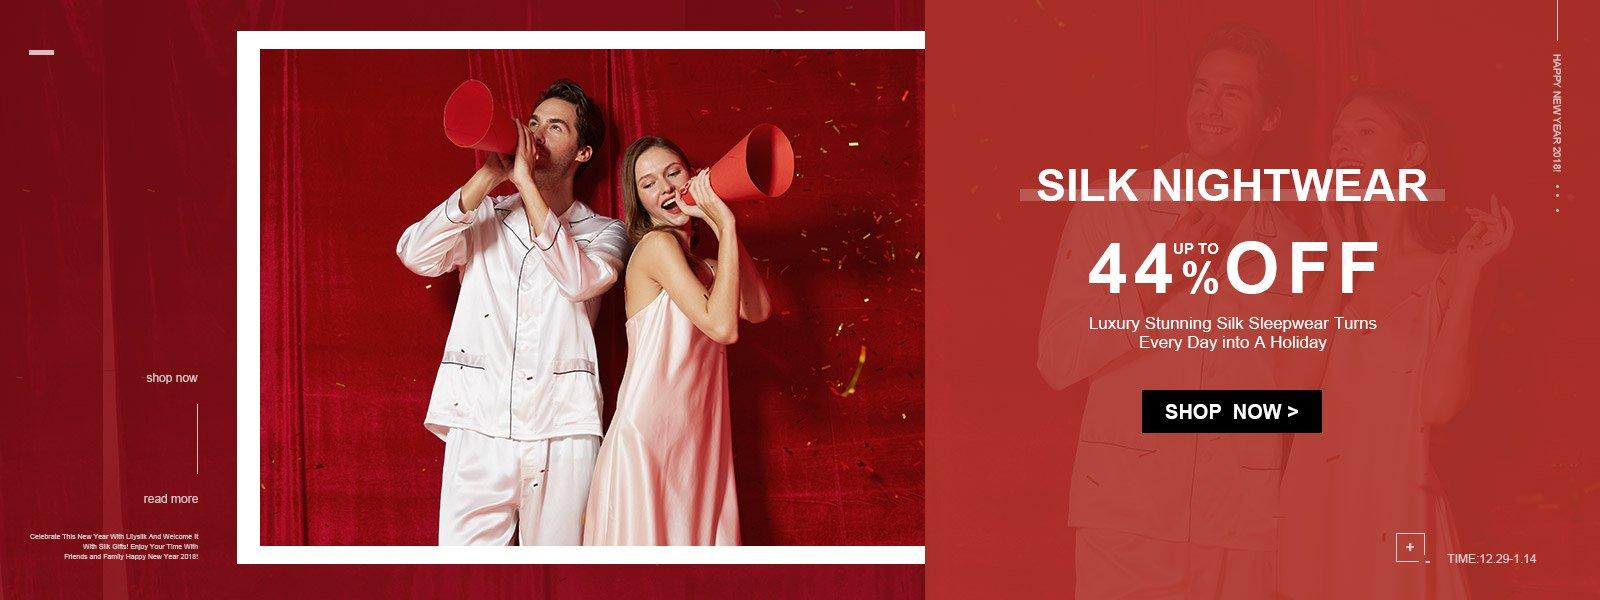 LilySilk LilySilk: Sale up to 44% off silk nightwear